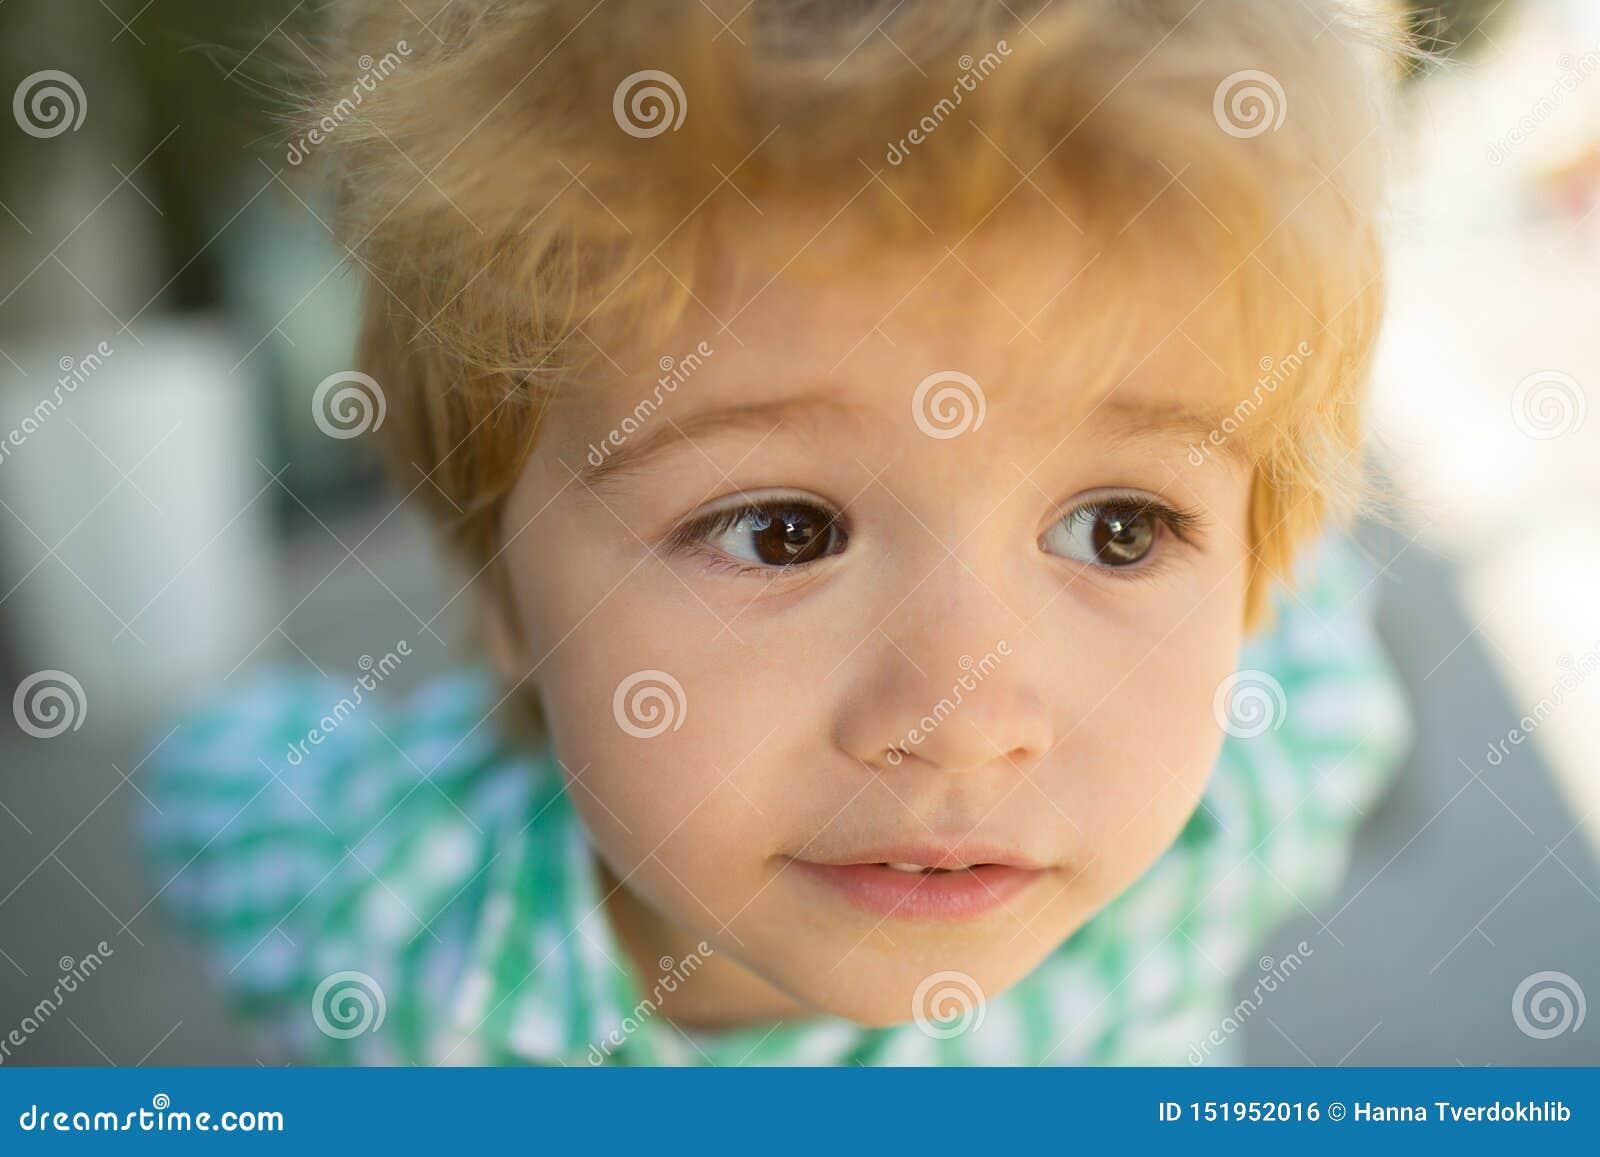 Children eye close up. Child portrait. Kid face. Funny baby. Beautiful children concept face.